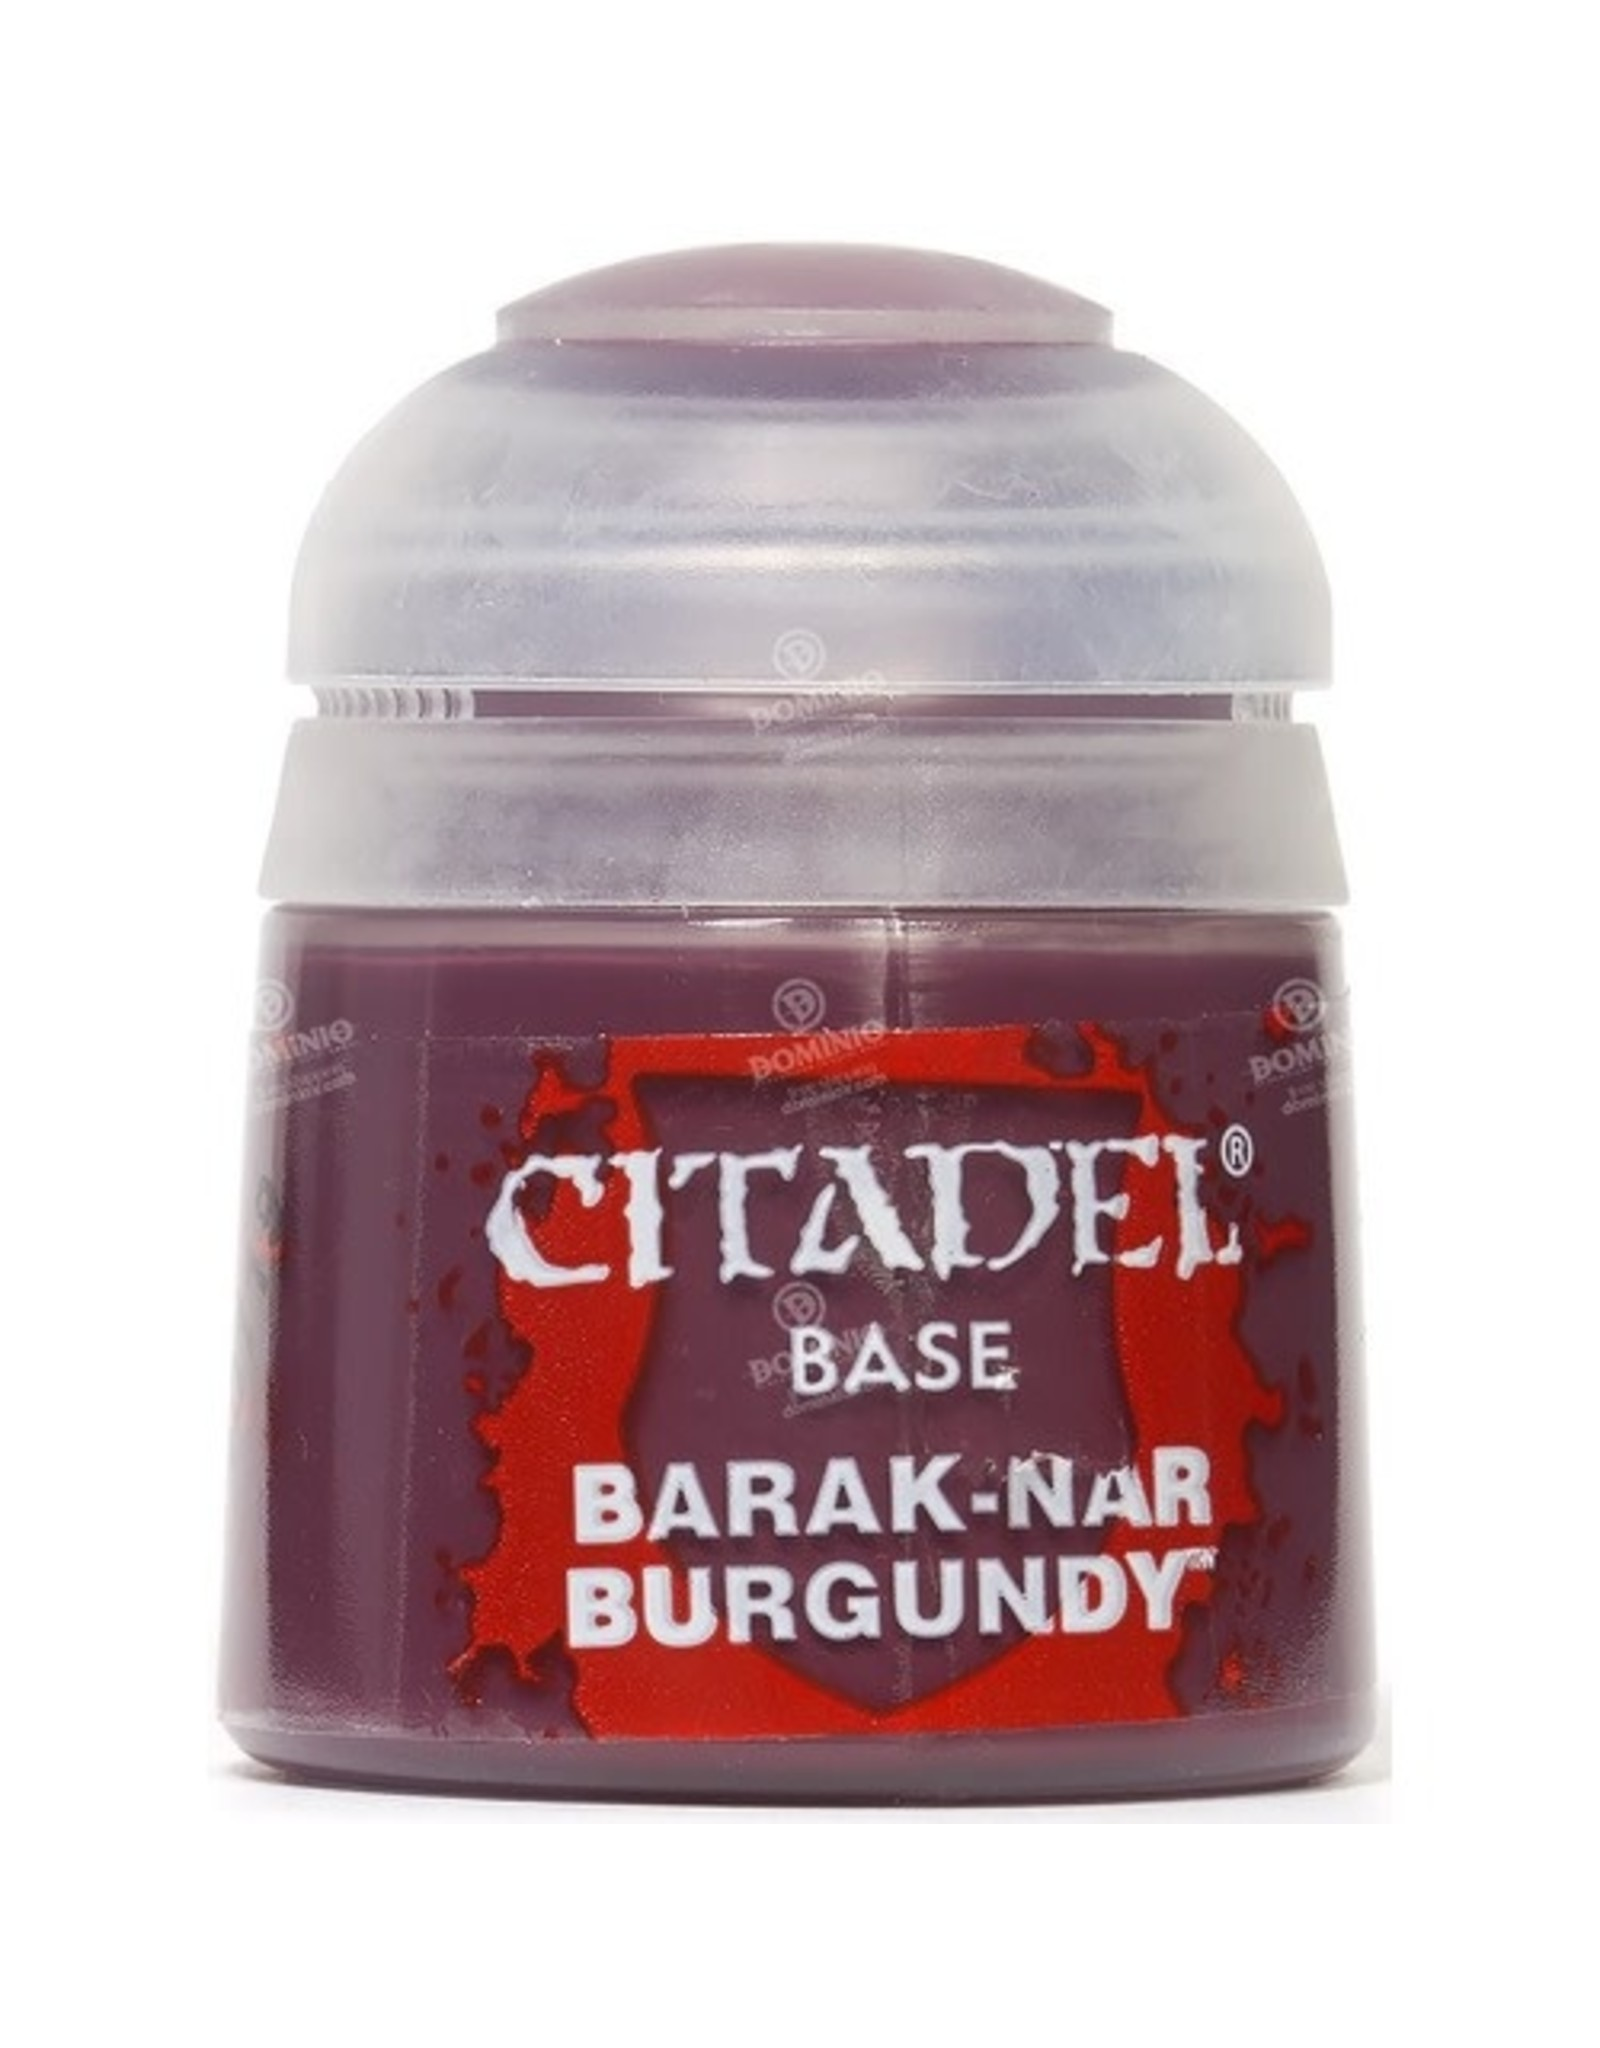 Games Workshop Citadel Paint: Barak-Nur Burgundy Base 12 ml